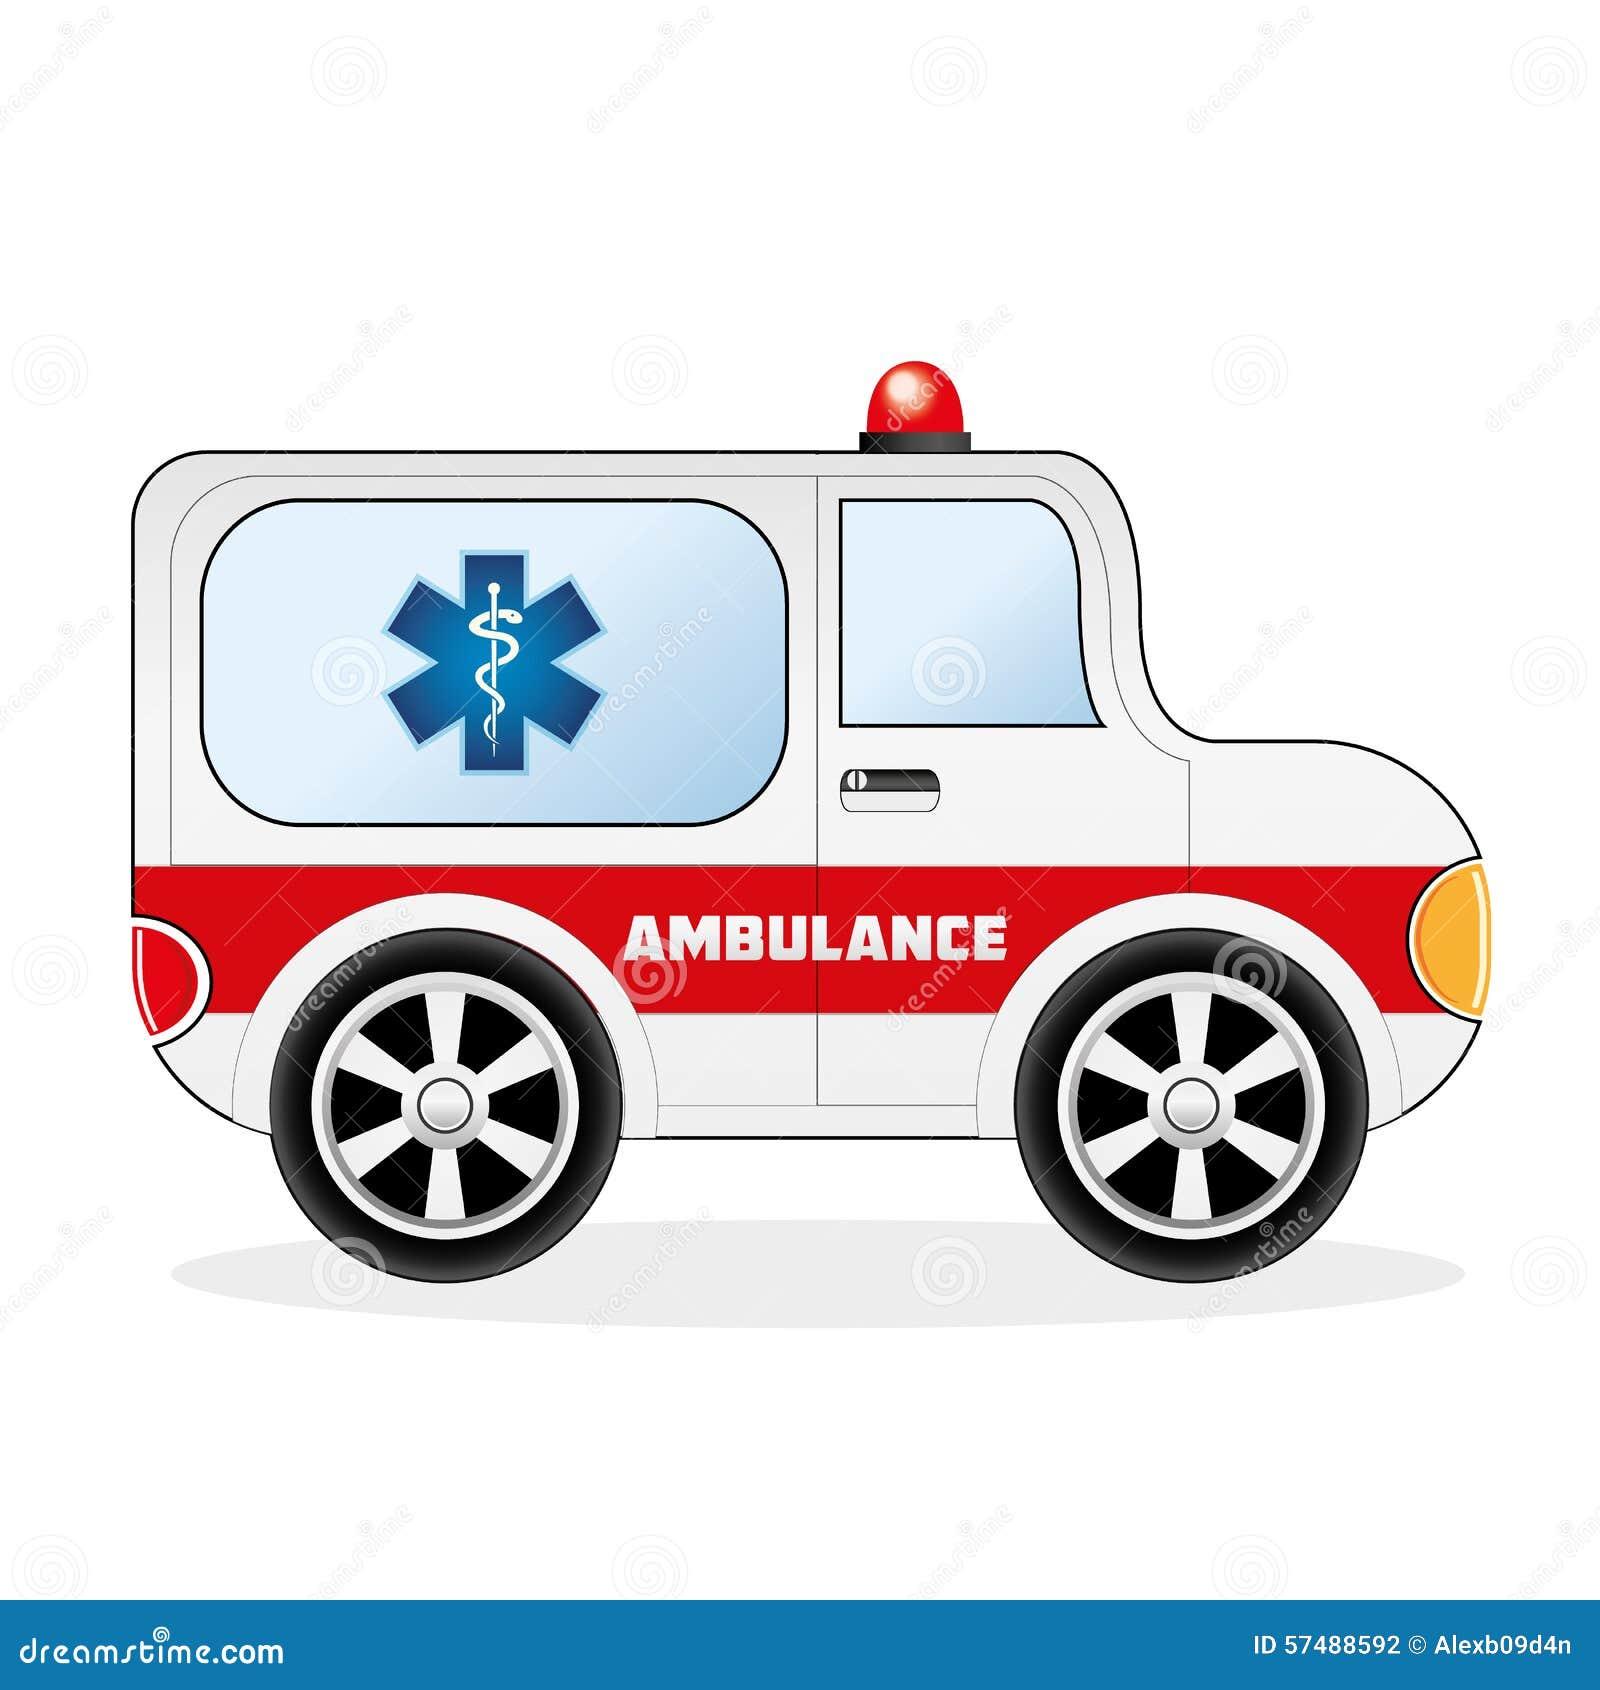 Download Anime Emergence: Cartoon Ambulance Royalty-Free Cartoon